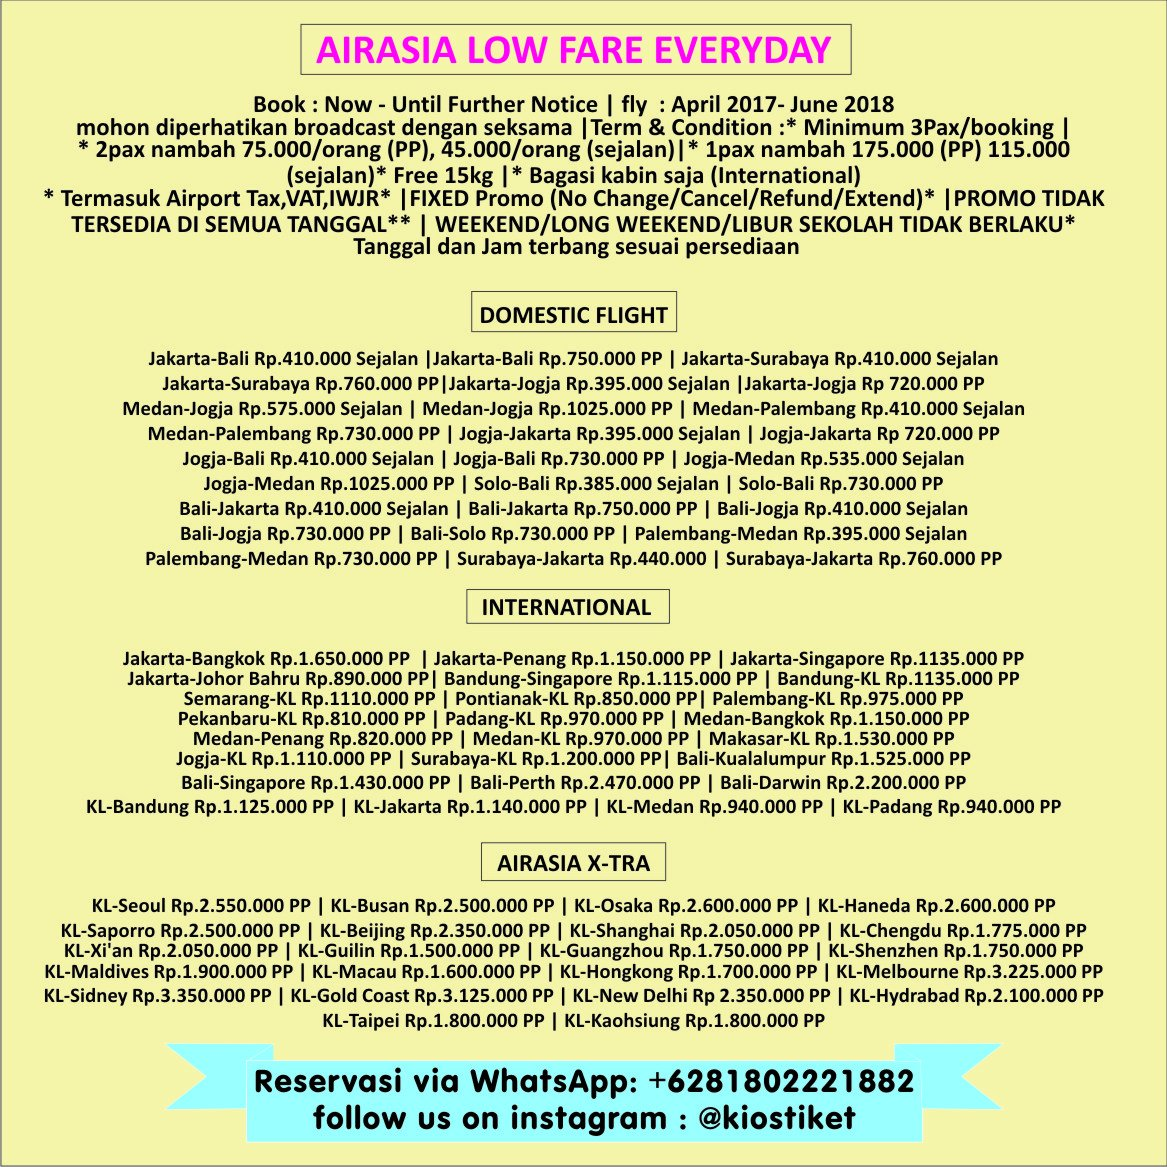 Hendry Norman On Twitter Air Asia Calling You Tiket Tiketpesawat 352 Am 5 Apr 2017